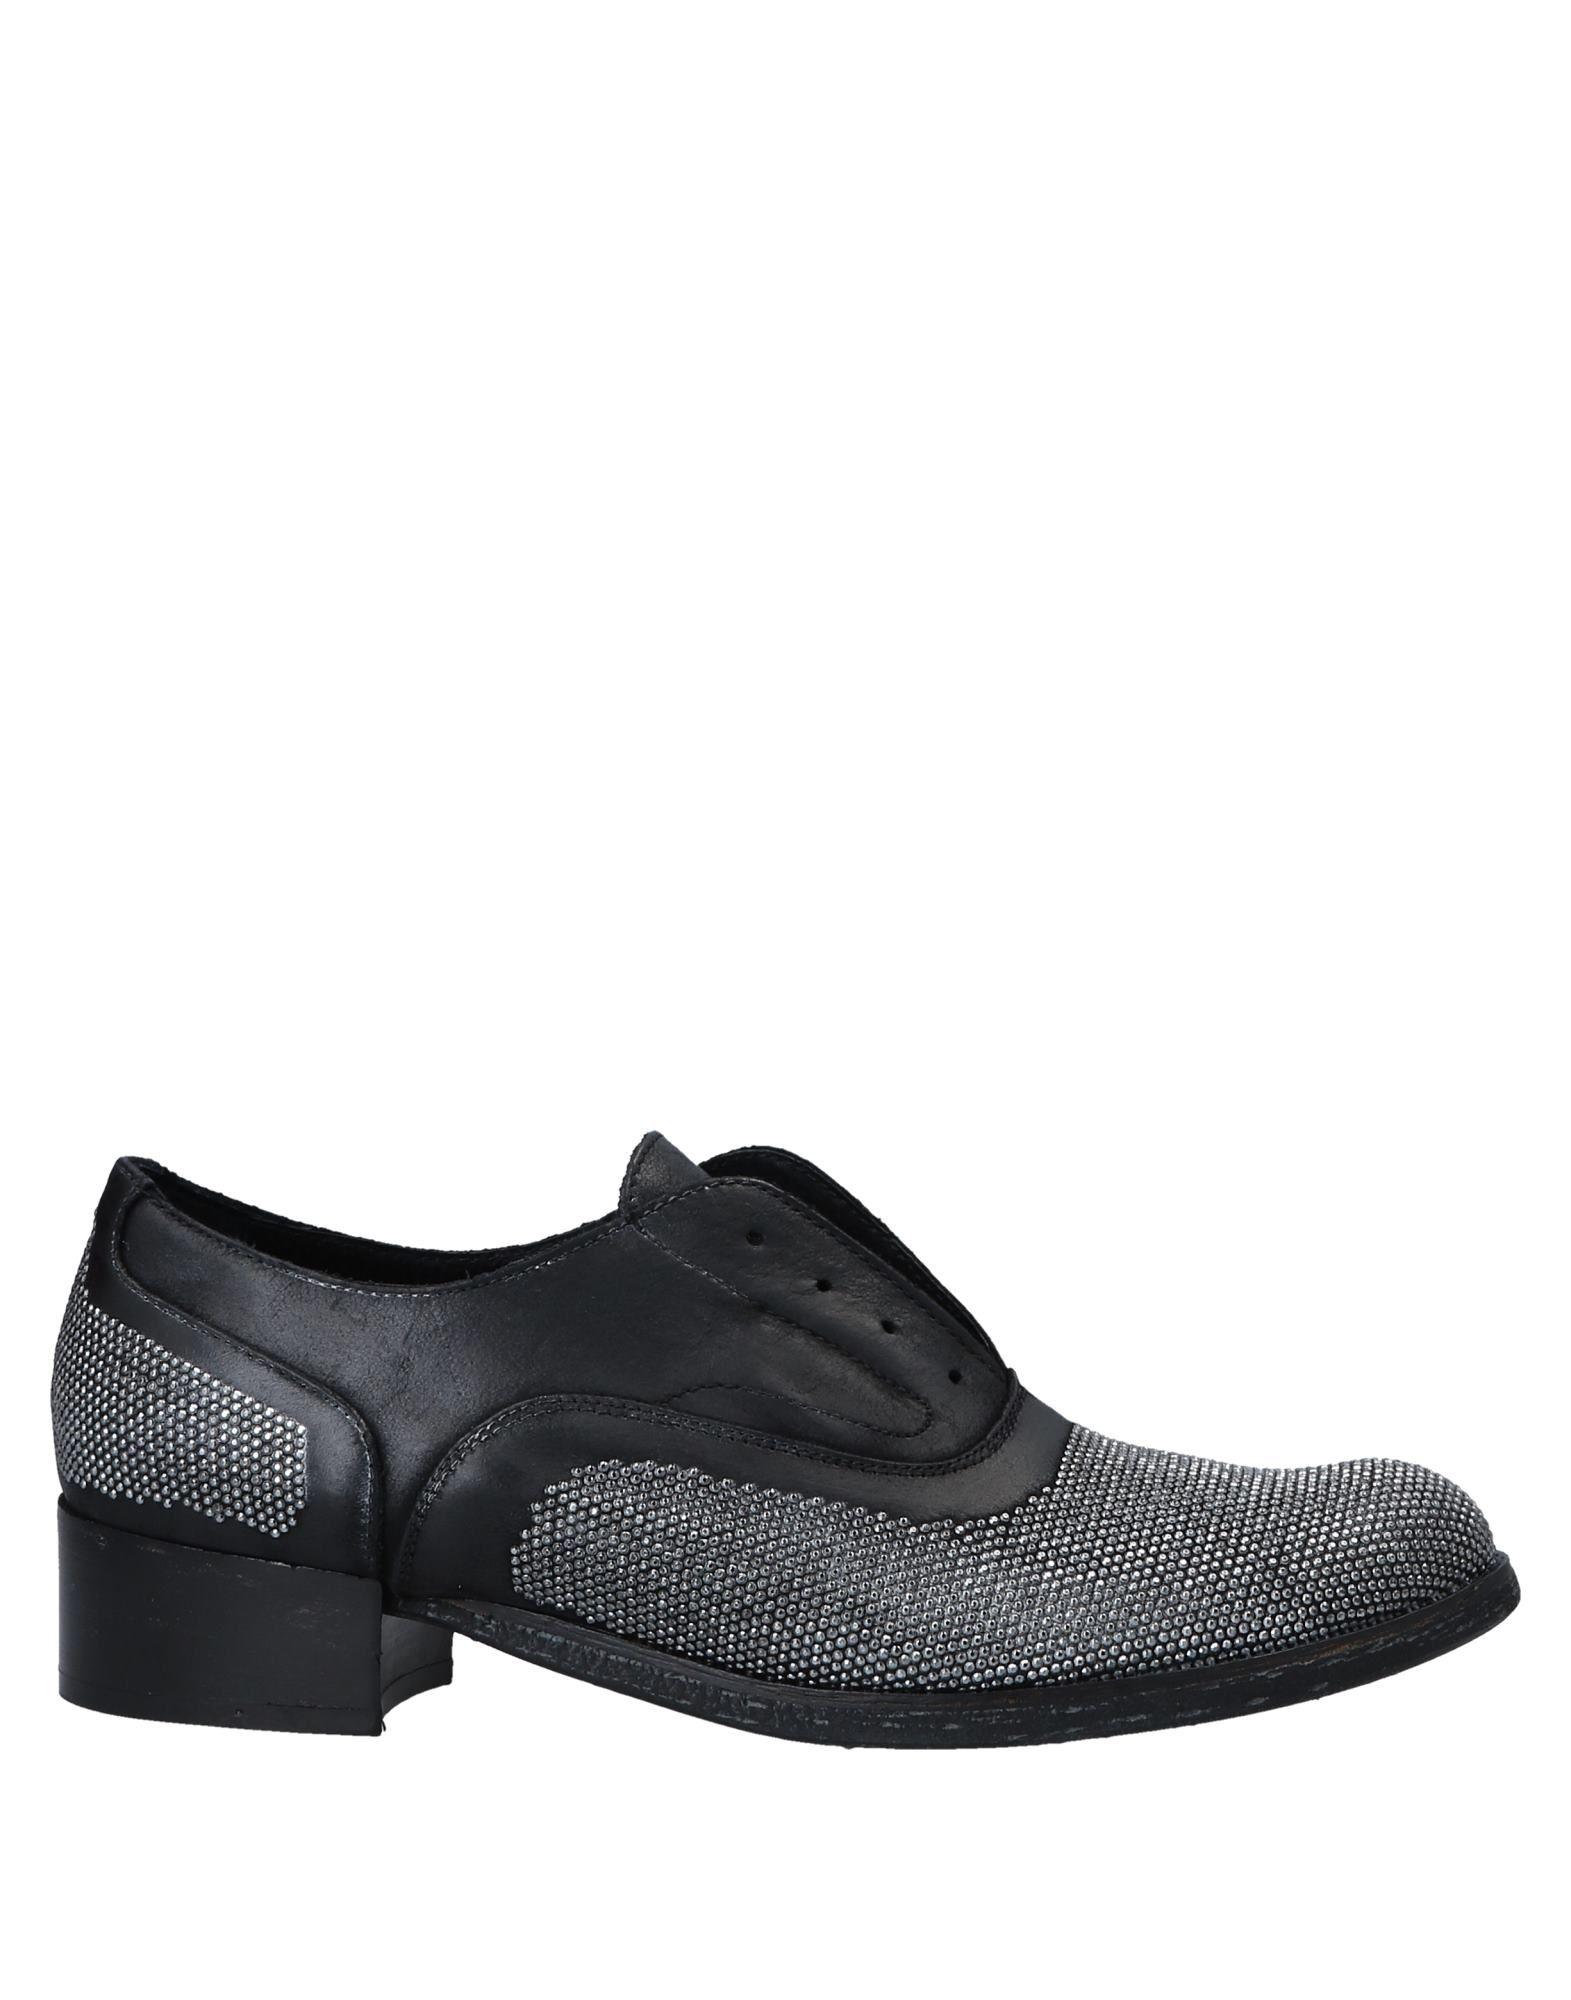 METISSE Обувь на шнурках metisse сапоги